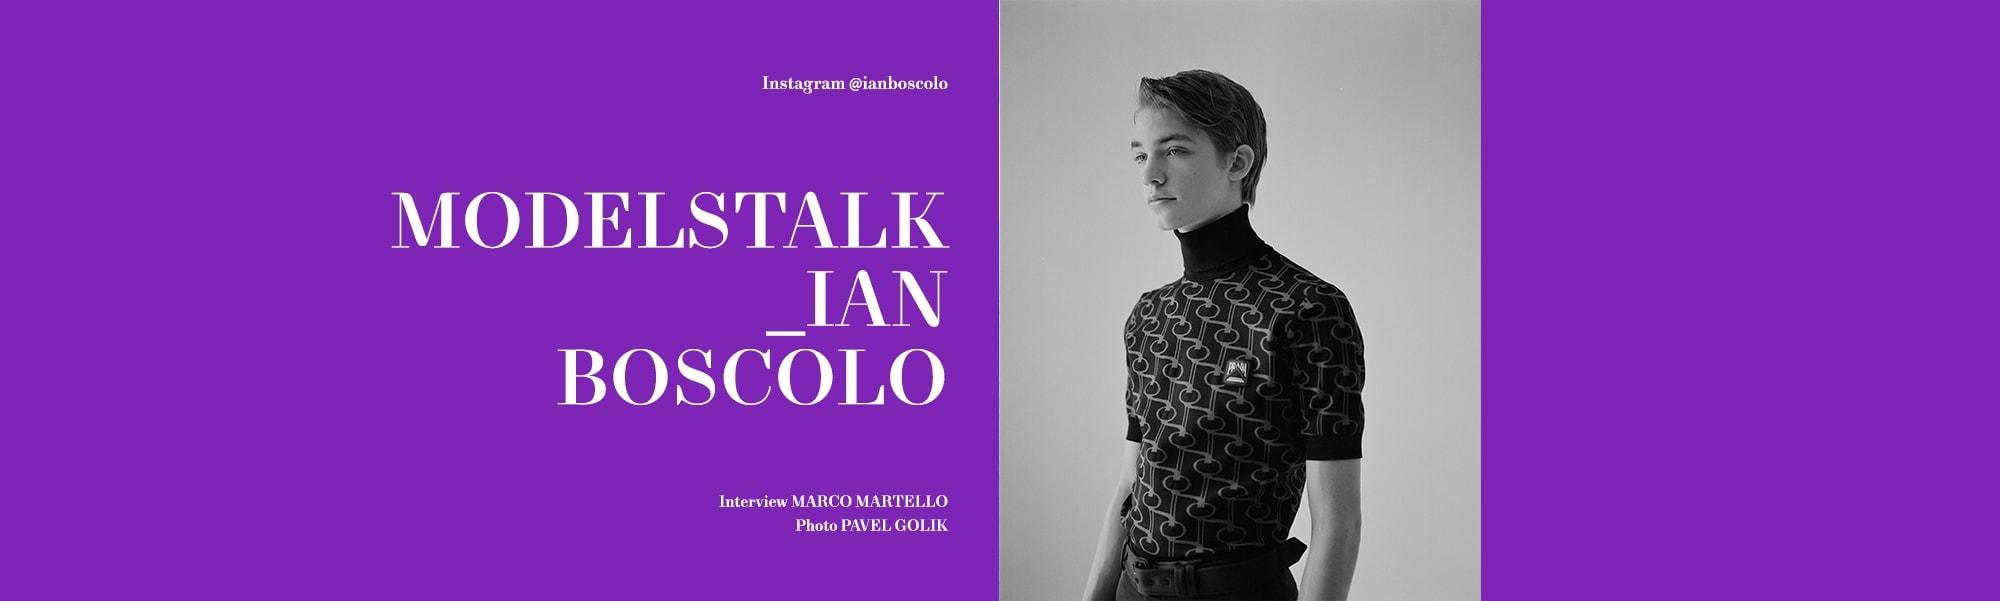 ian-boscolo-main-banner-thegreatestmagazine-talkinghead